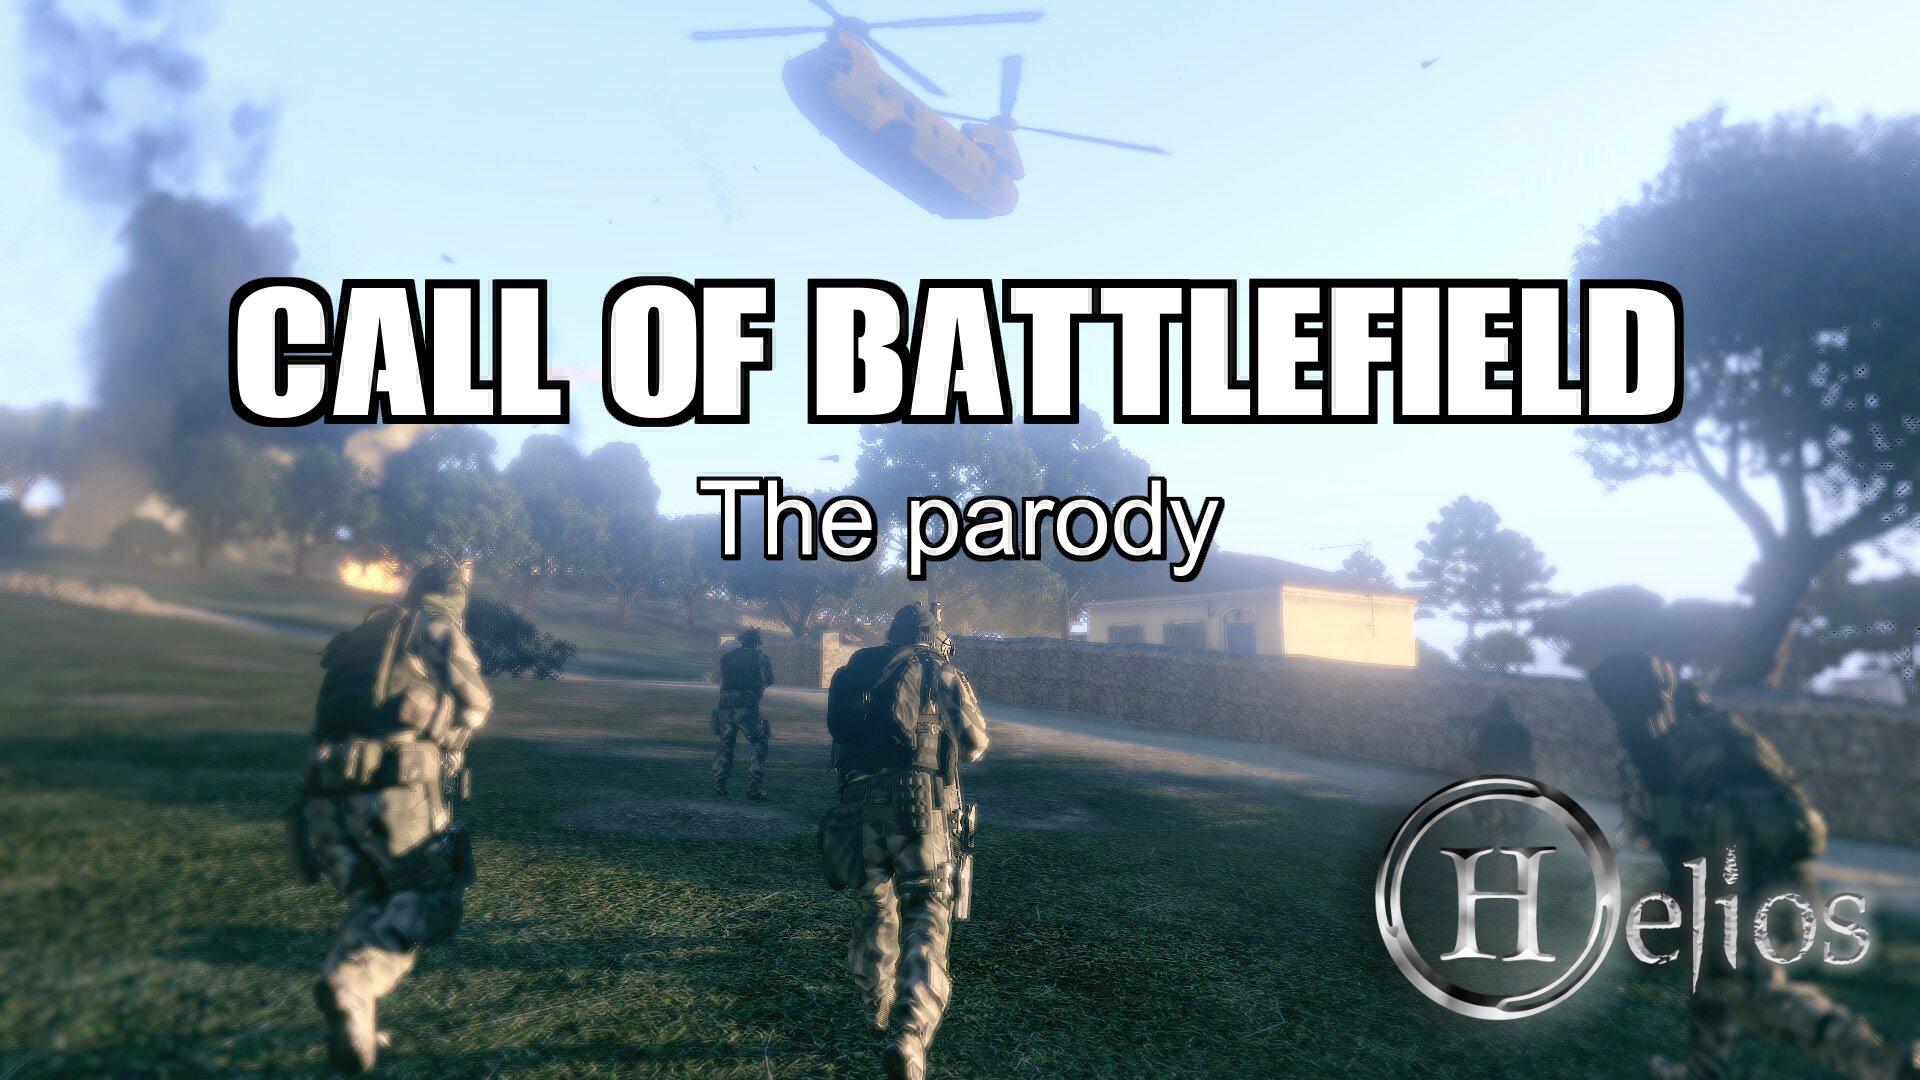 [SP] Call of Battlefield (Parody)